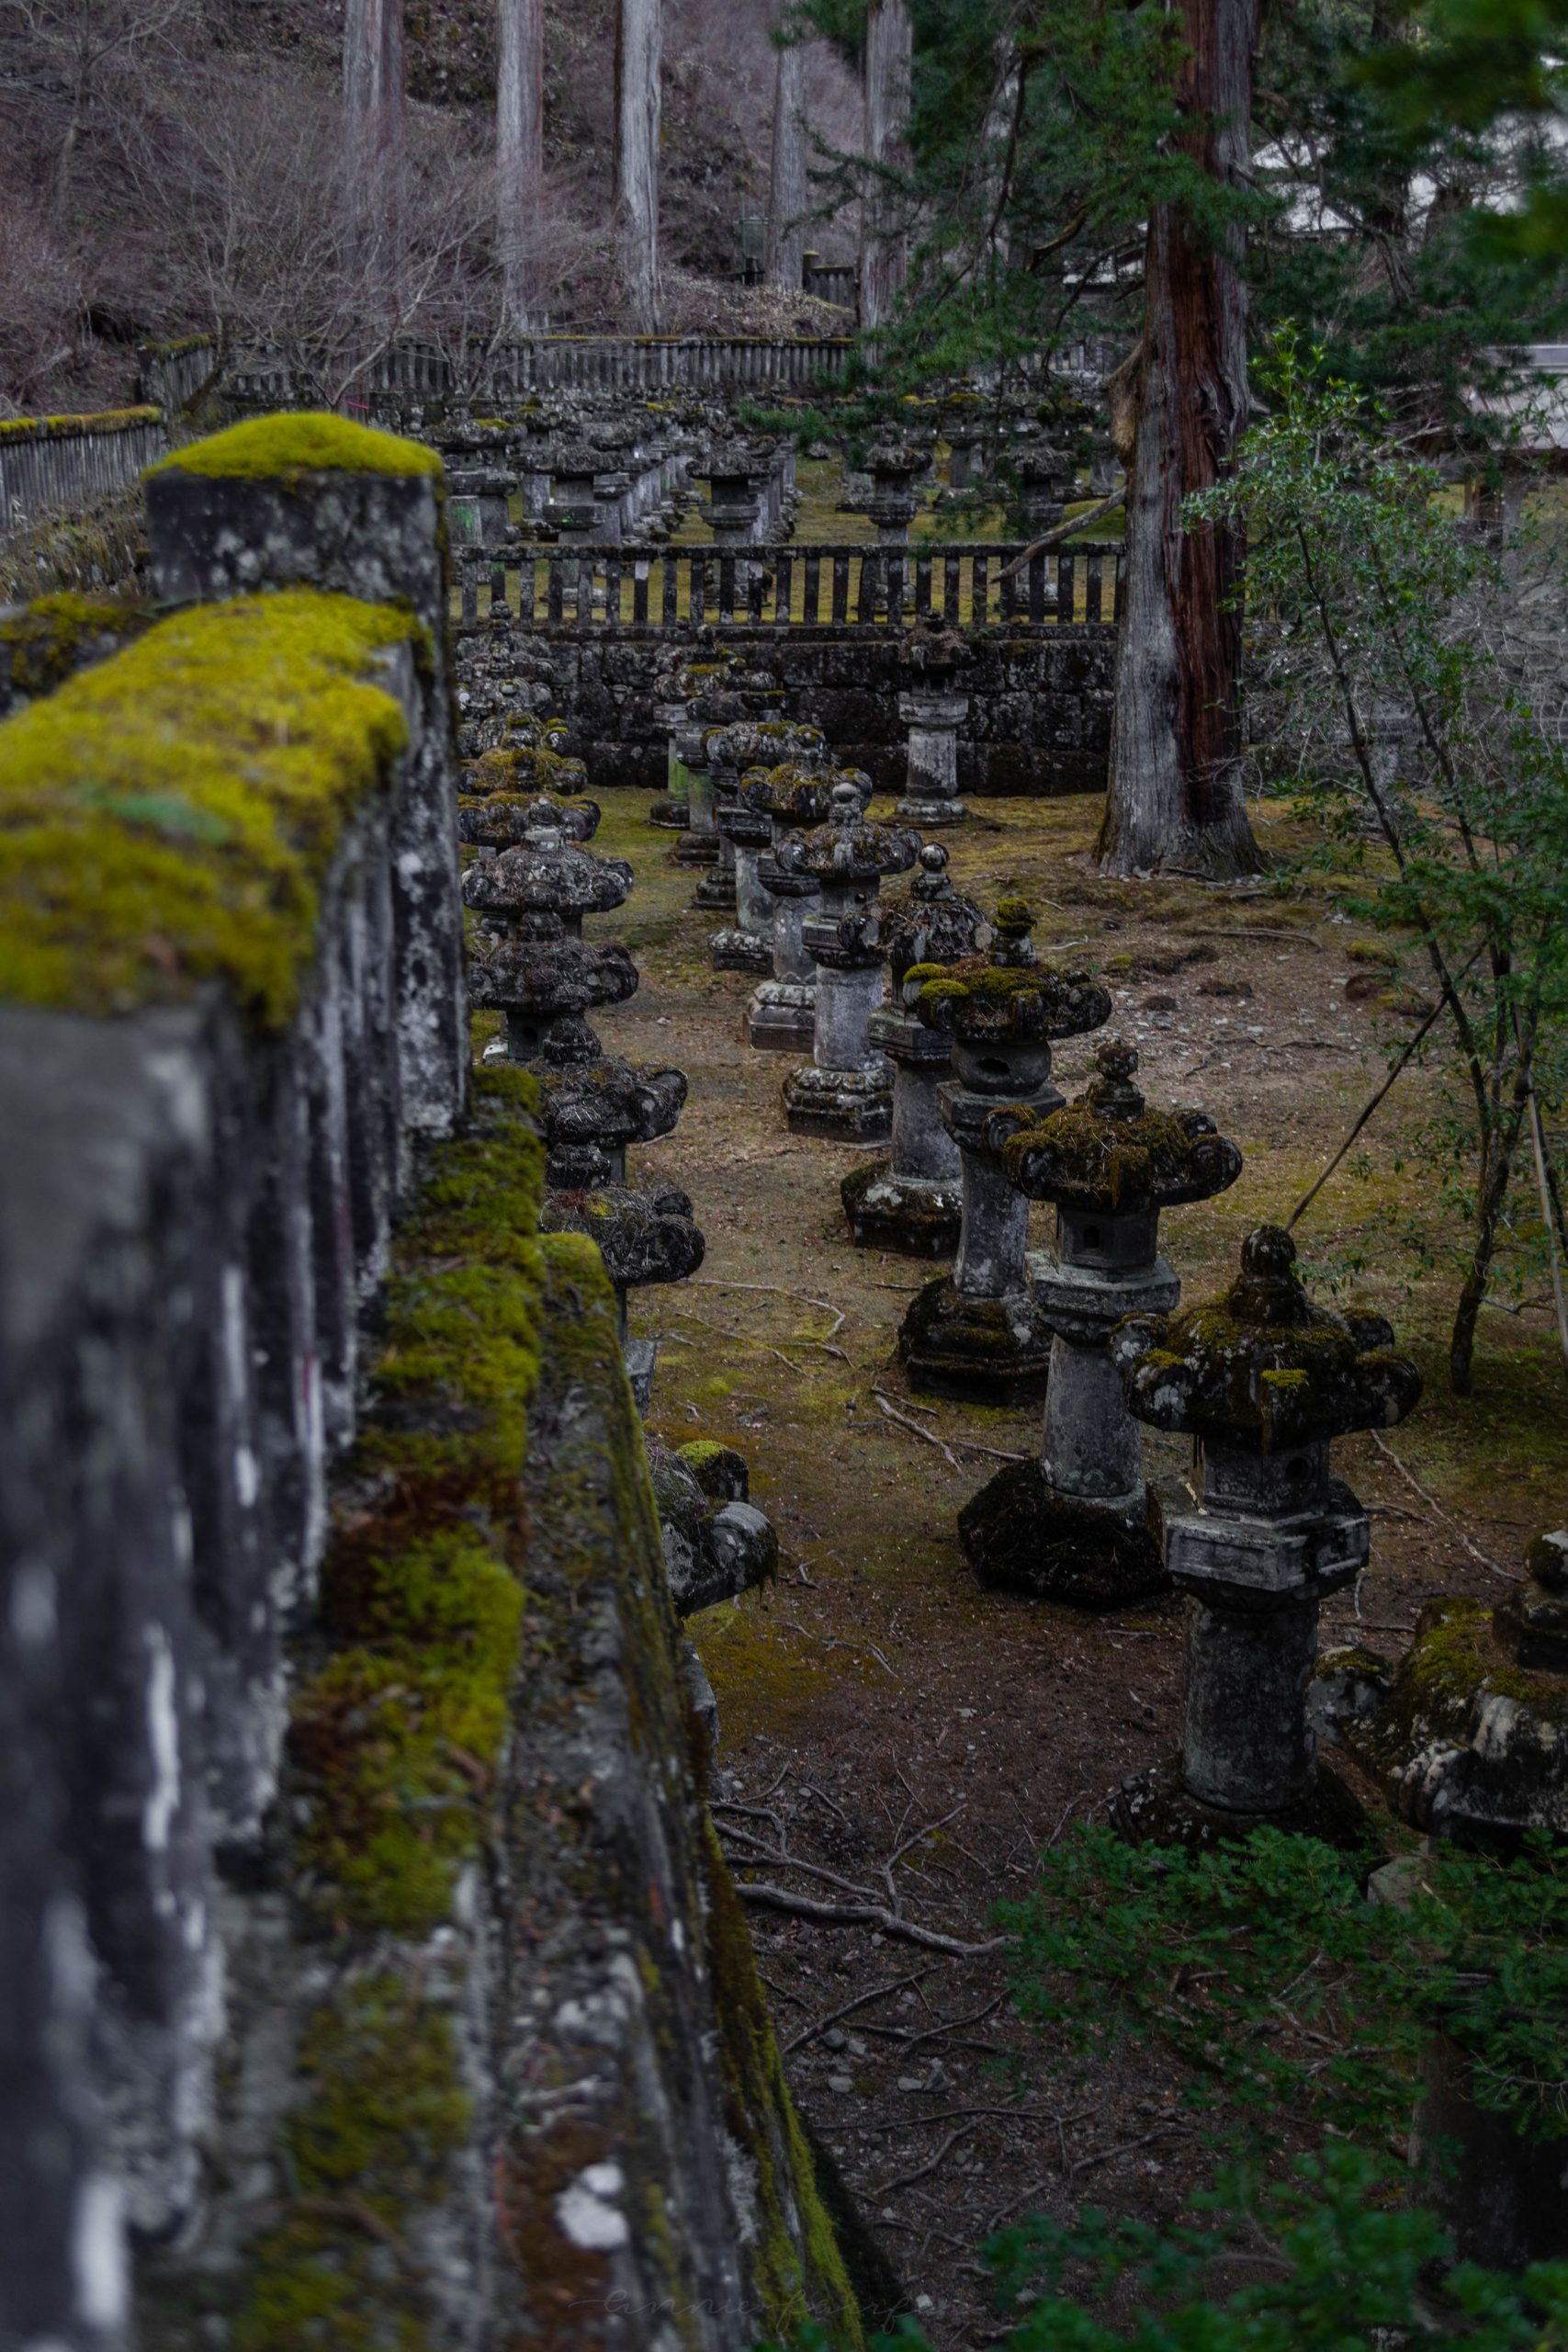 Stone Lanterns at Shinto Shrines